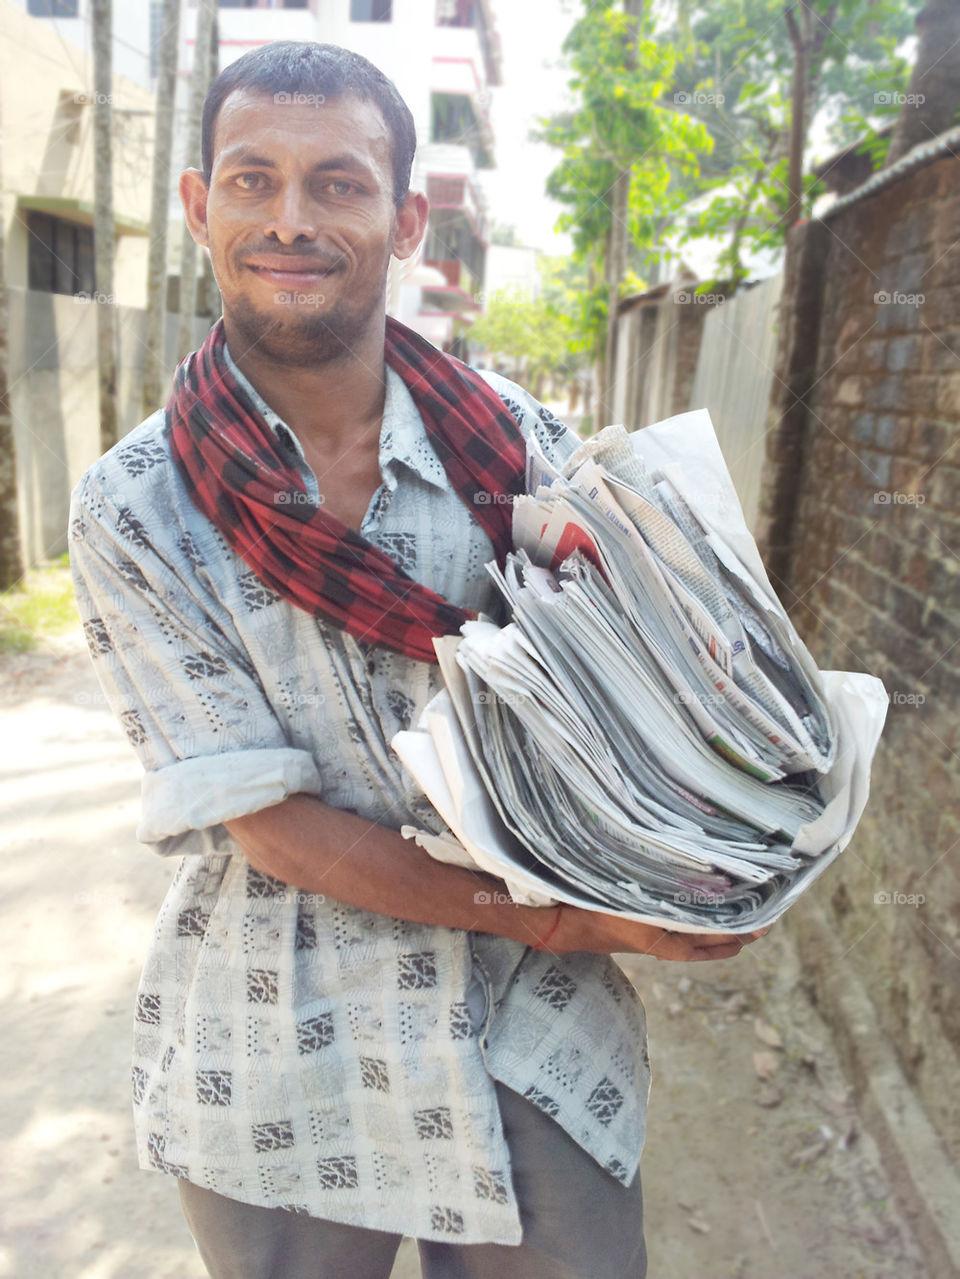 Paperwala — a Vendor